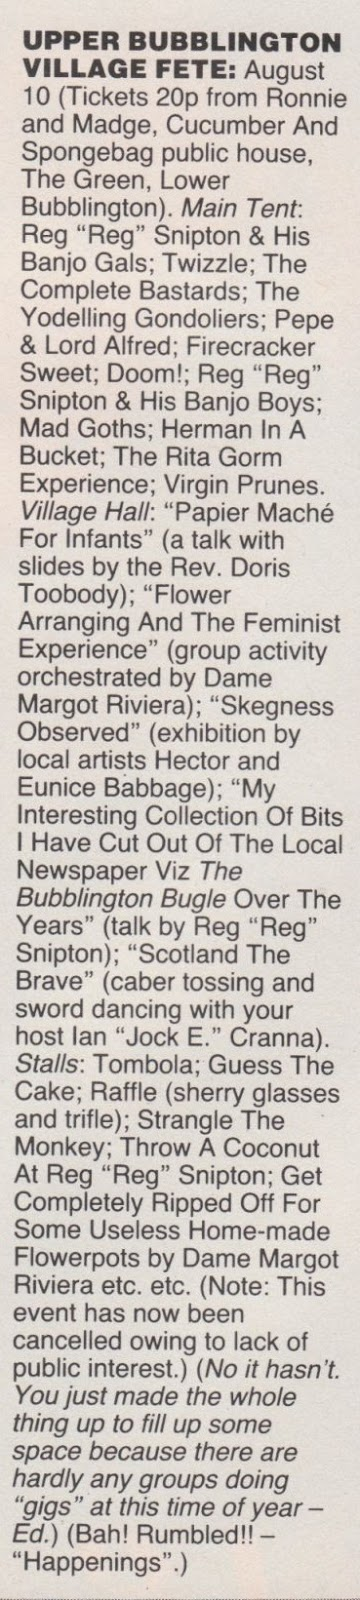 Upper Bubblington Village Fete spoof listing from Smash Hits (1986).